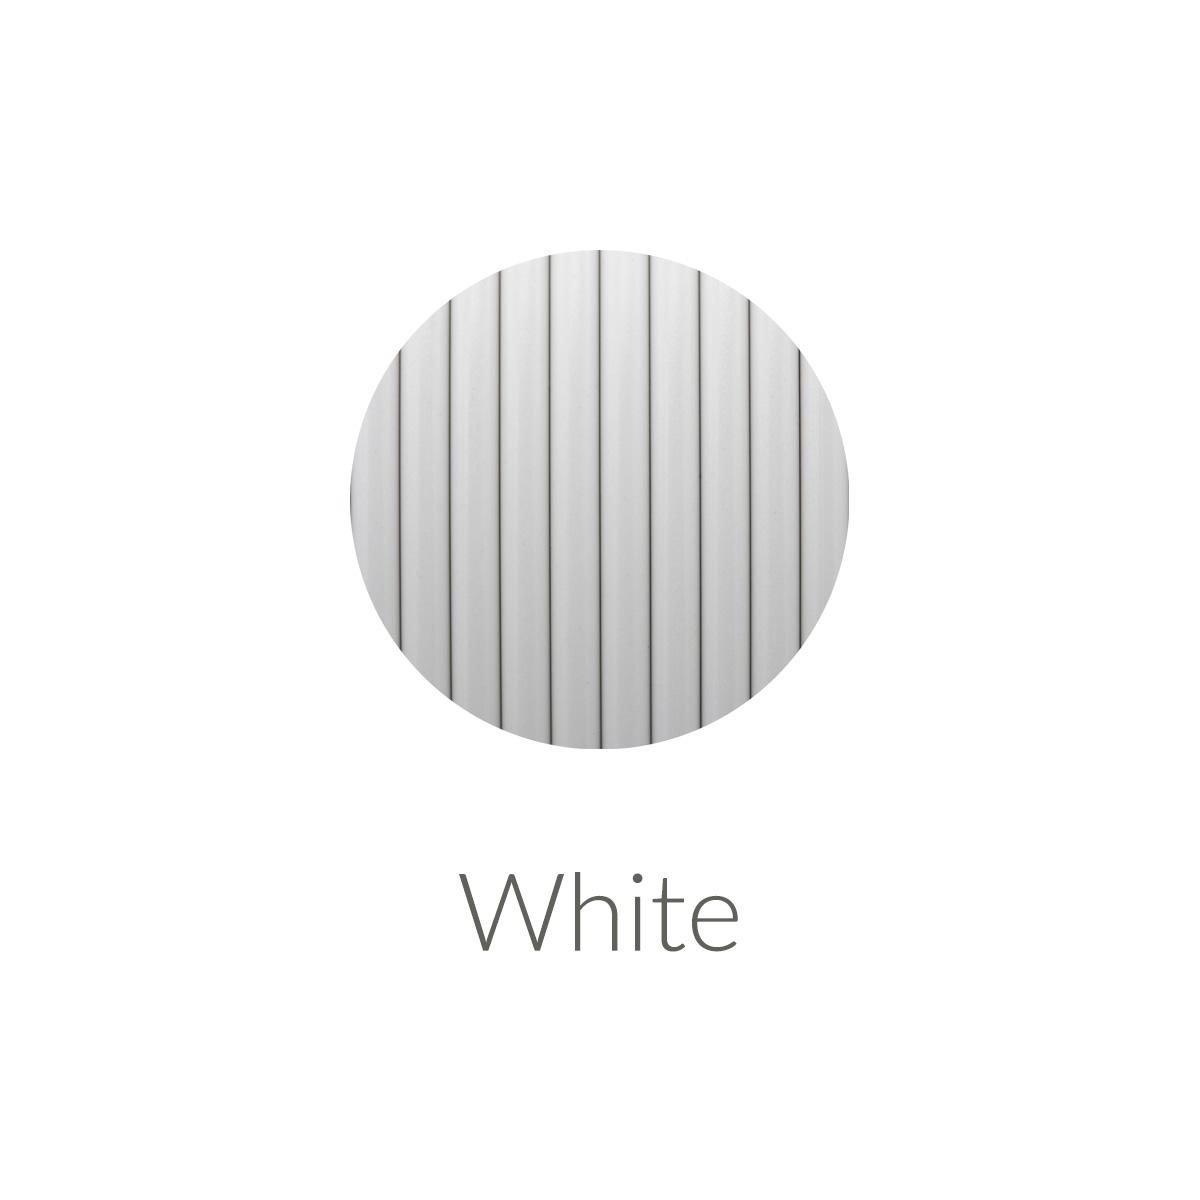 JABIL PA 4500 2.85 WHITE SWATCH